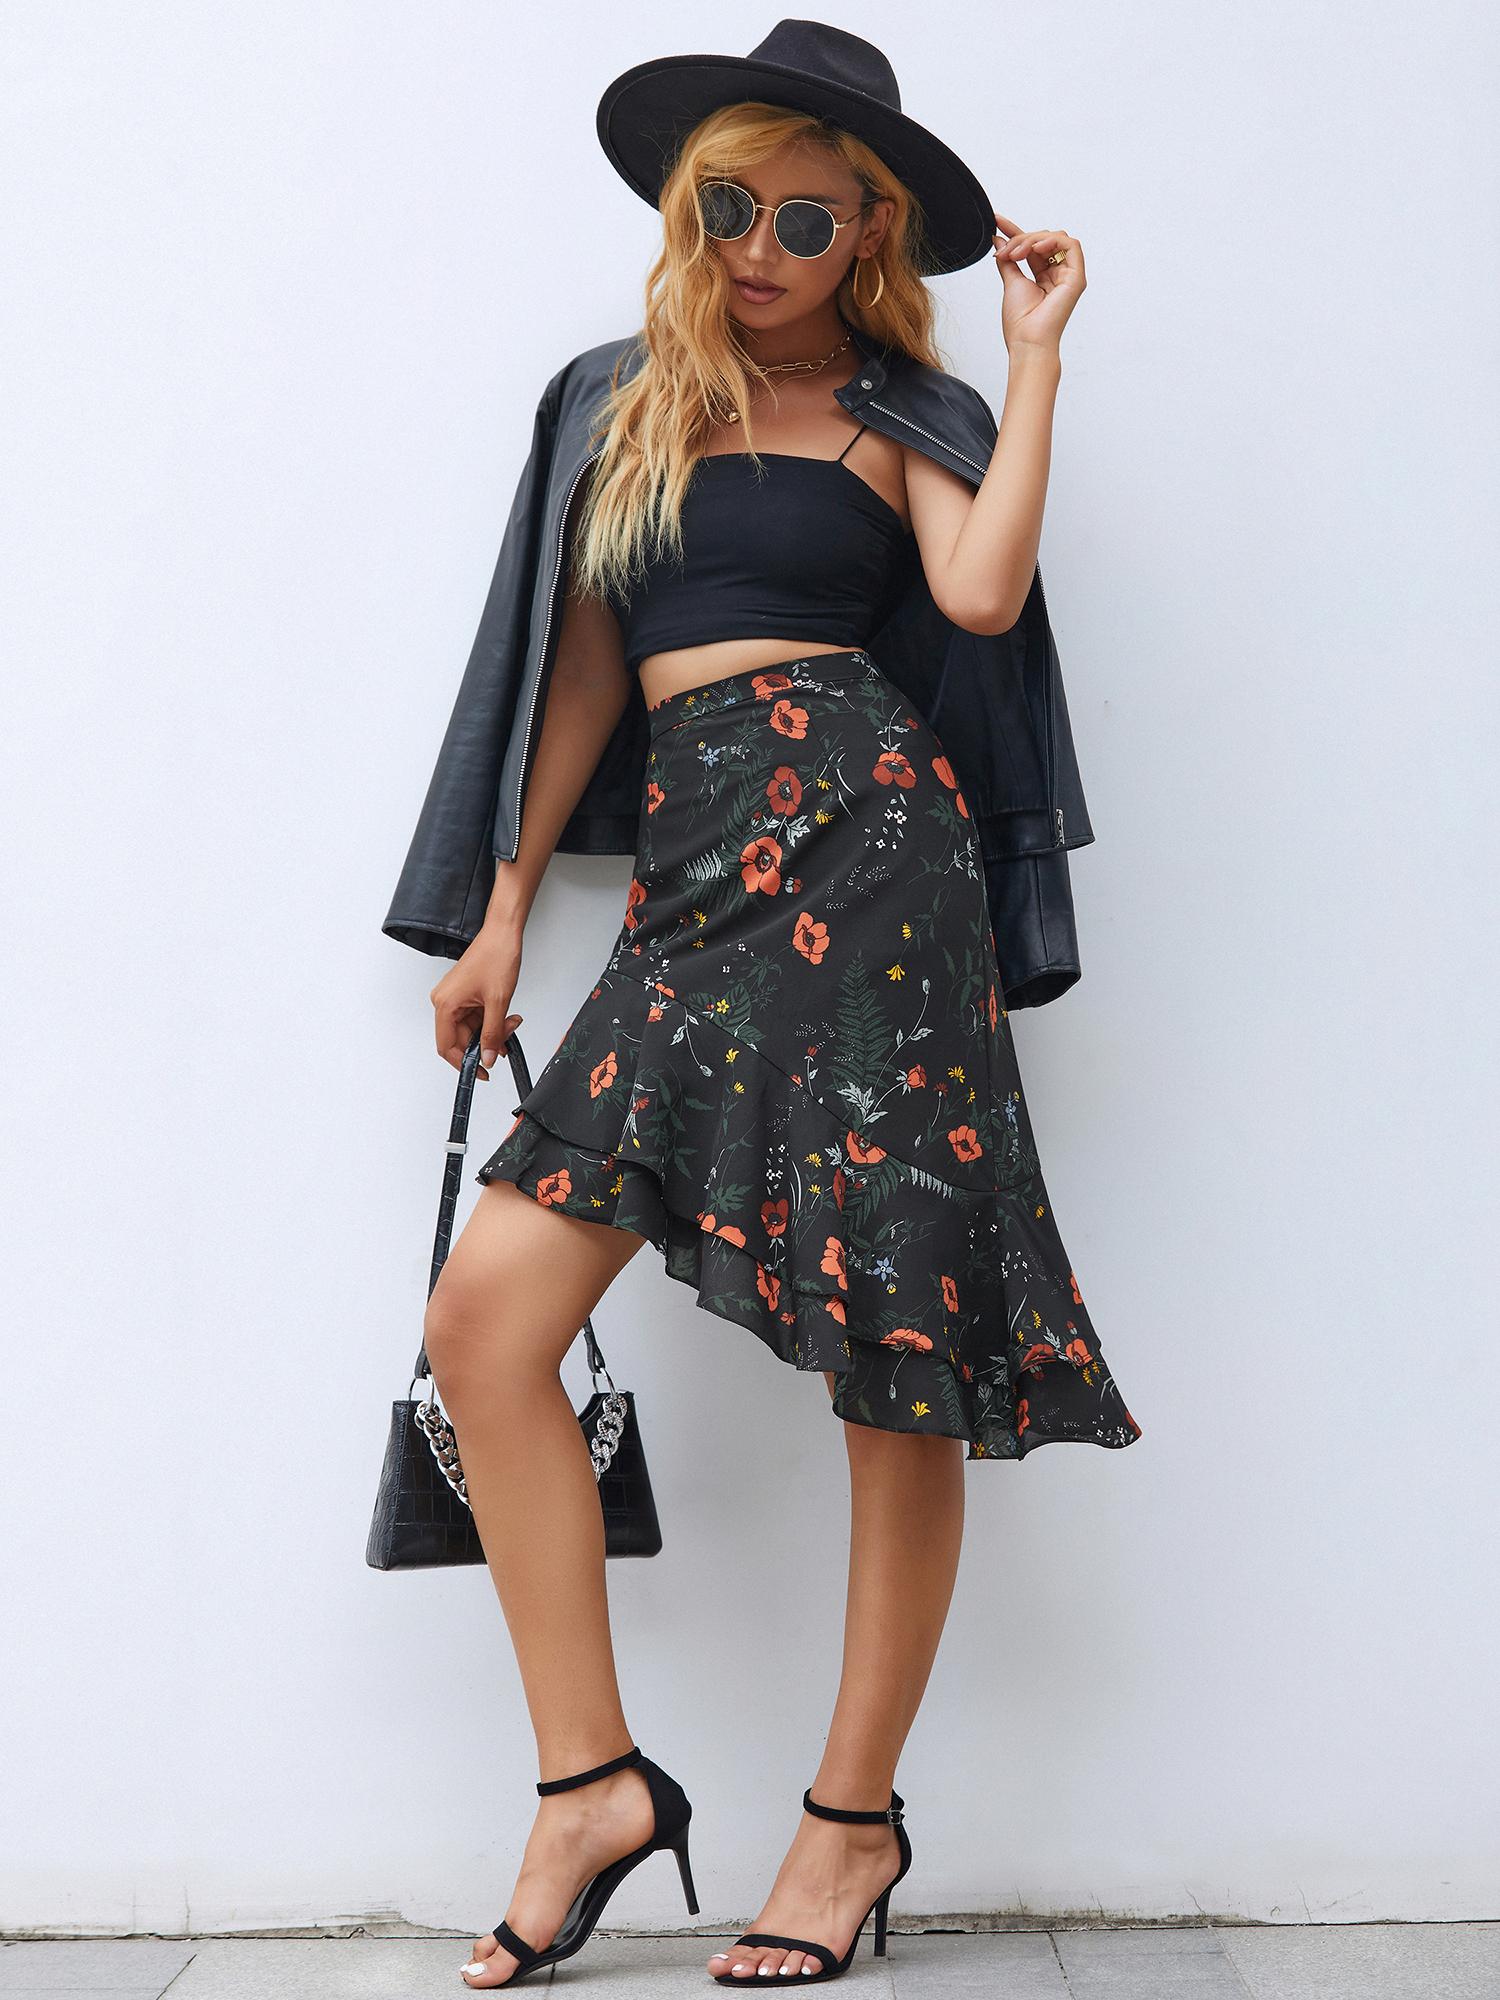 AlisaPan-Lady-Ruffles-Fashion-Vintage-Pencil-Skirts-Floral-Casual-Dress-01134